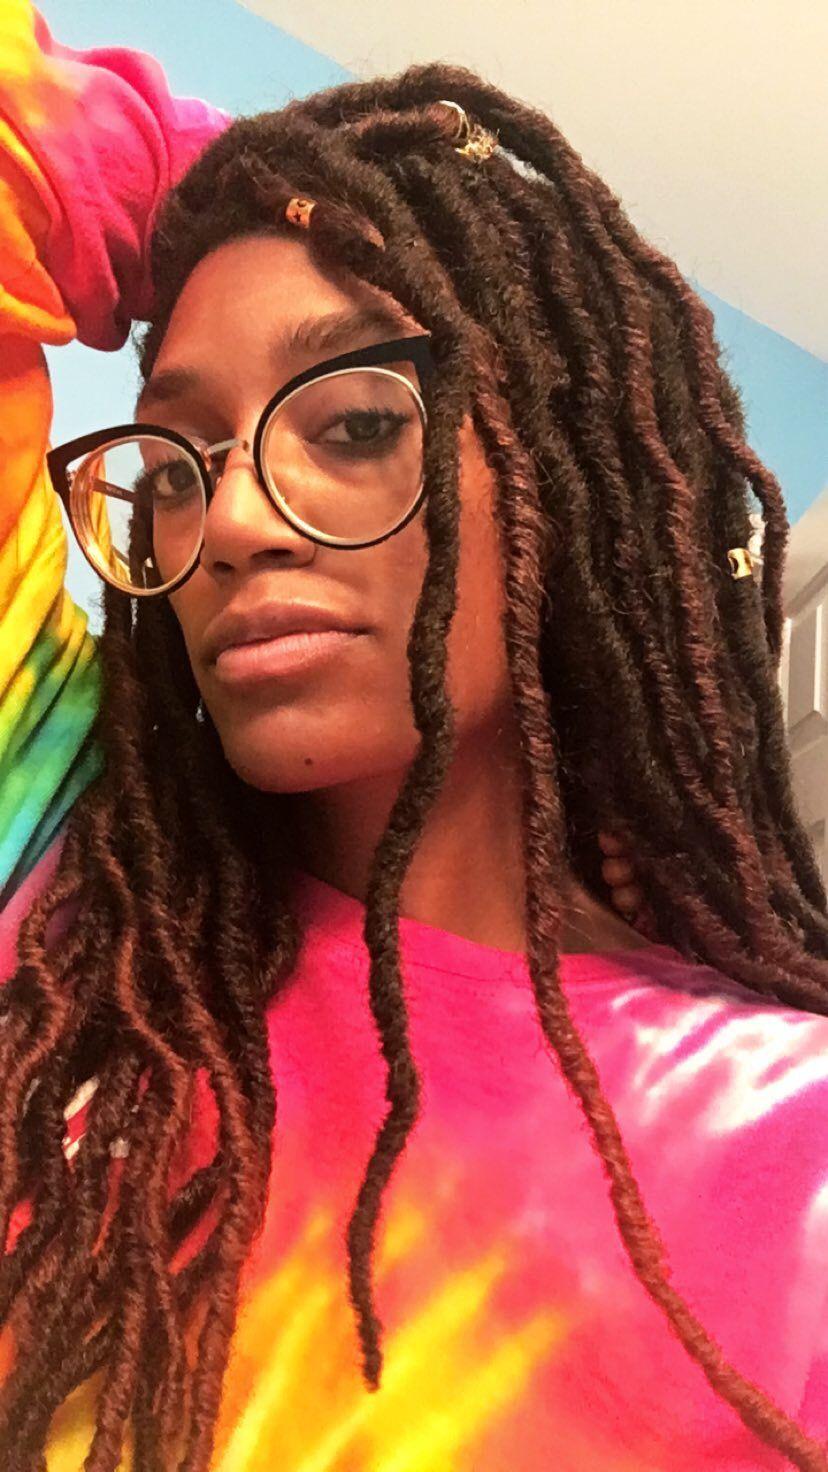 Faux Locs Freetress Bo Locs 18in In Caramelt Crochet Hair Styles Natural Hair Styles Hair Lengths